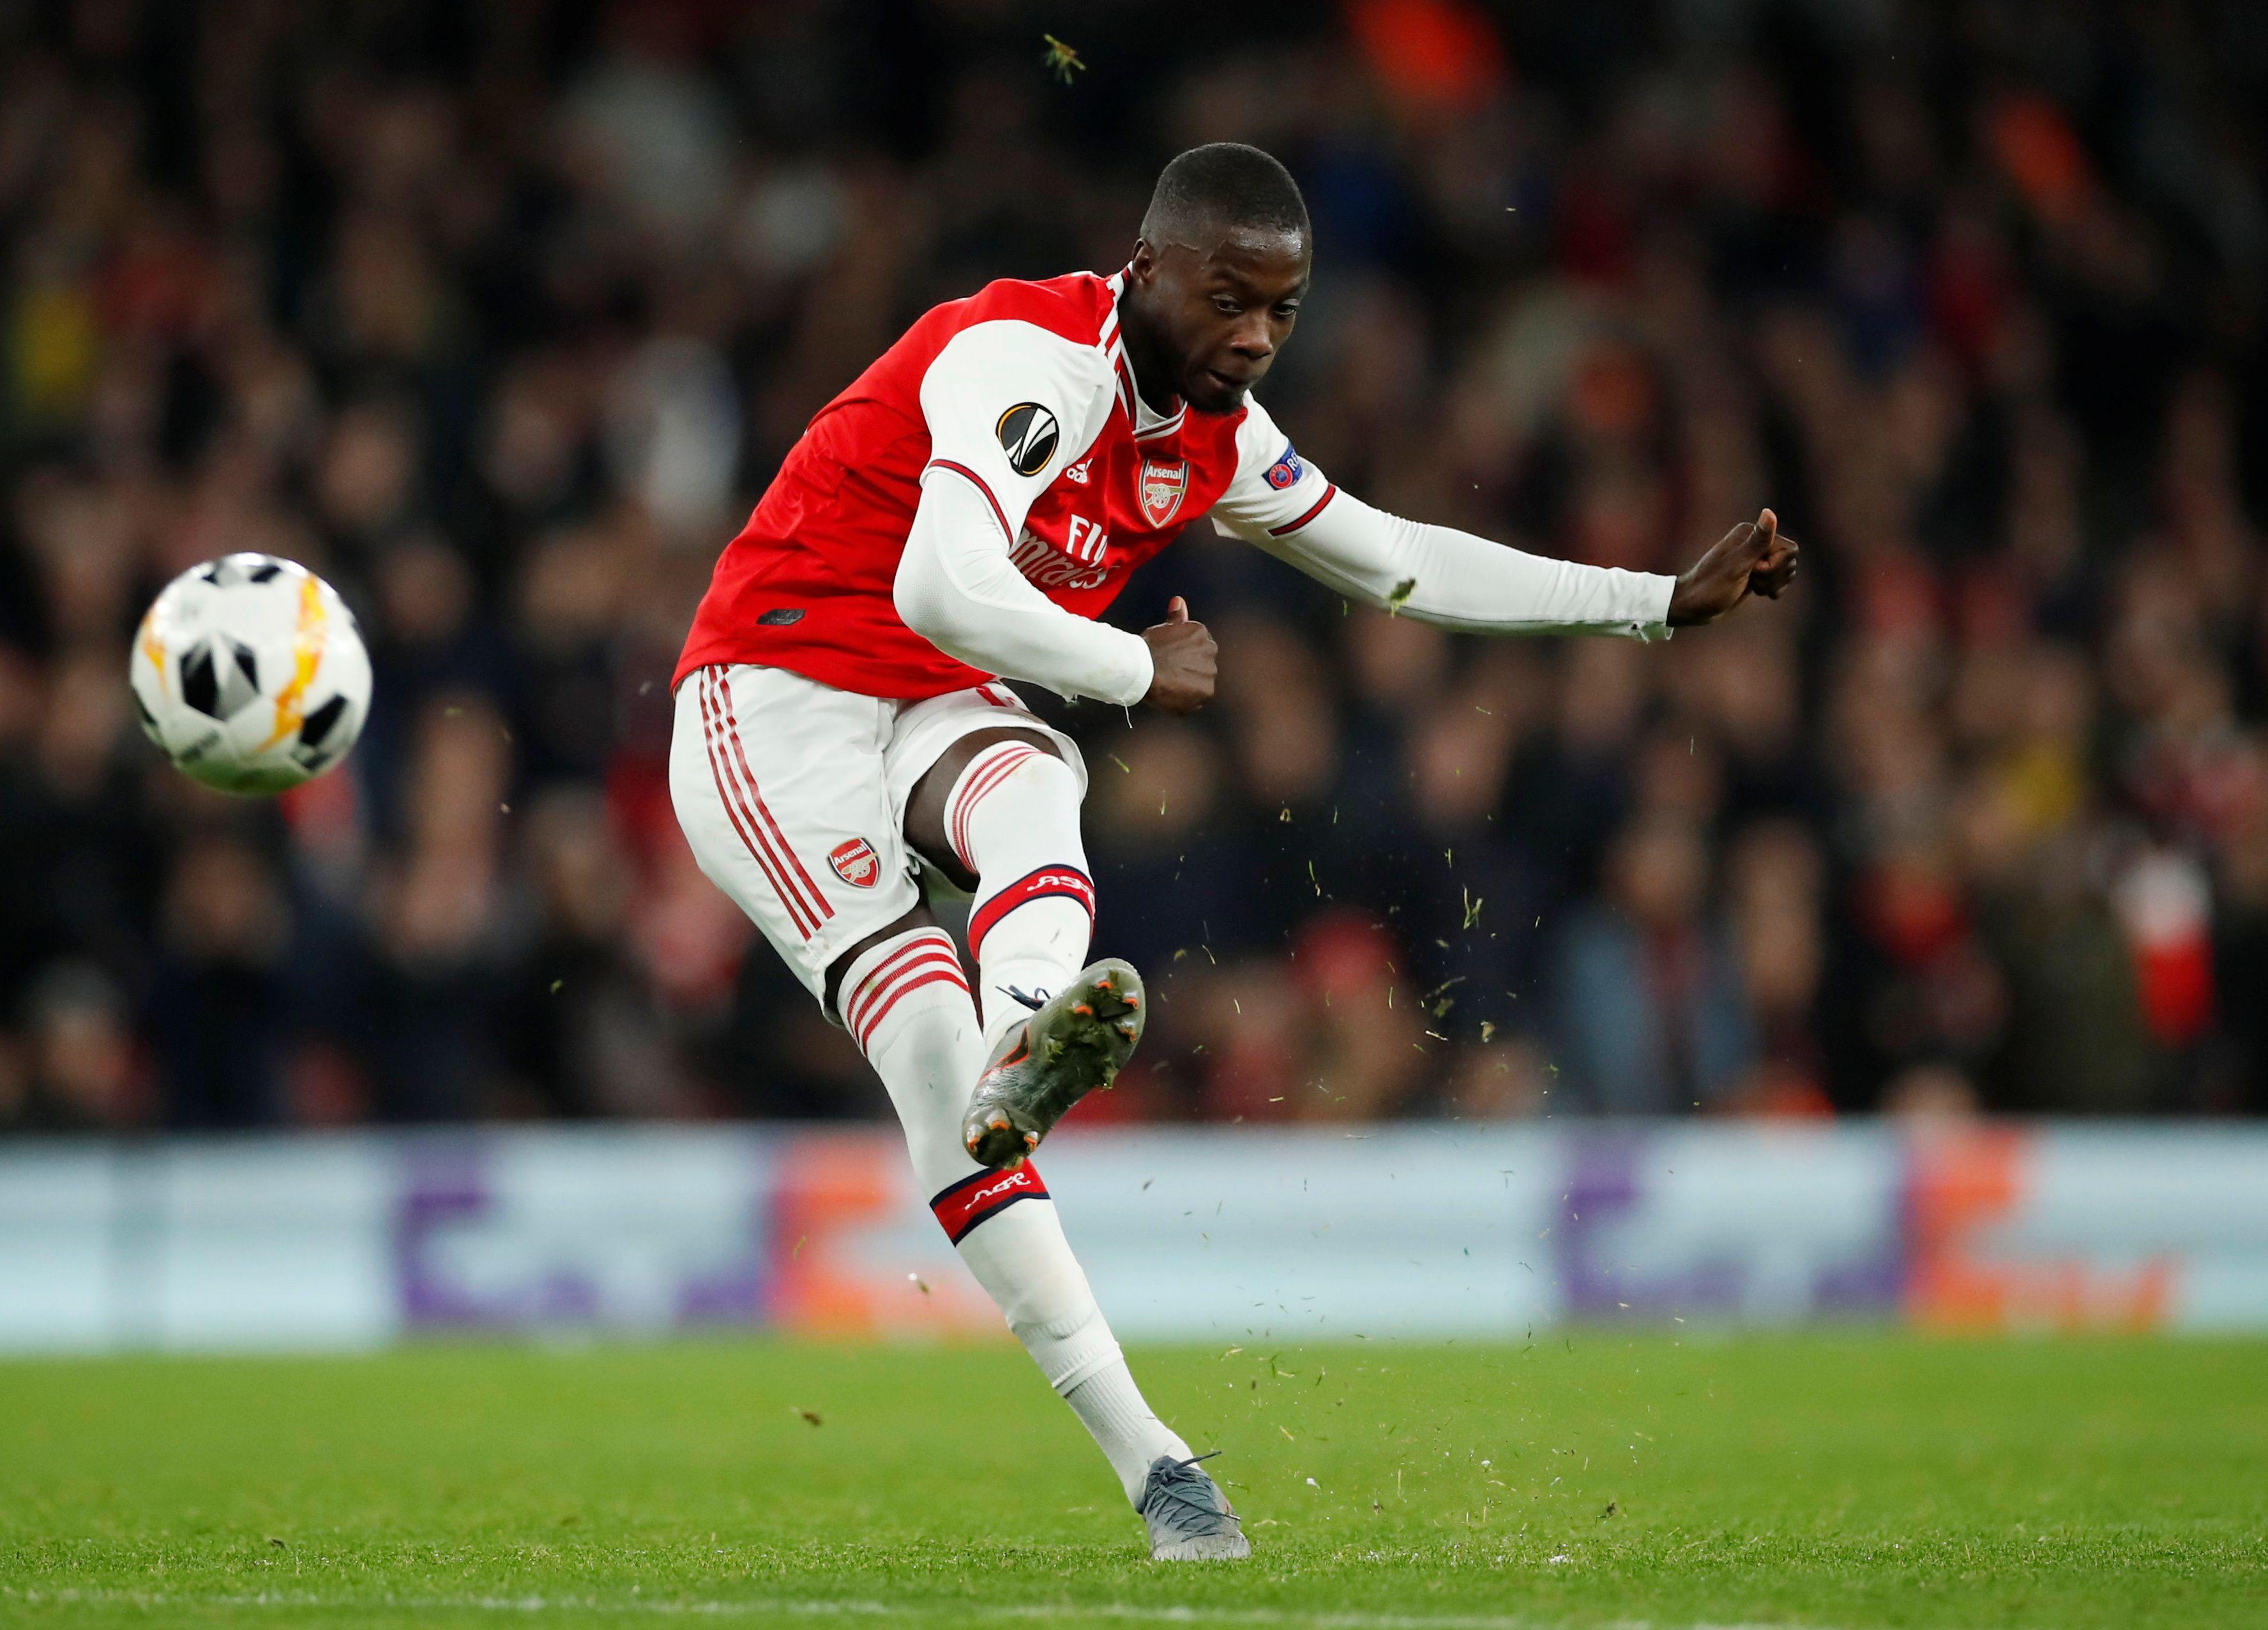 Football - Ligue Europa - Ligue Europa: Guimaraes-Arsenal en direct